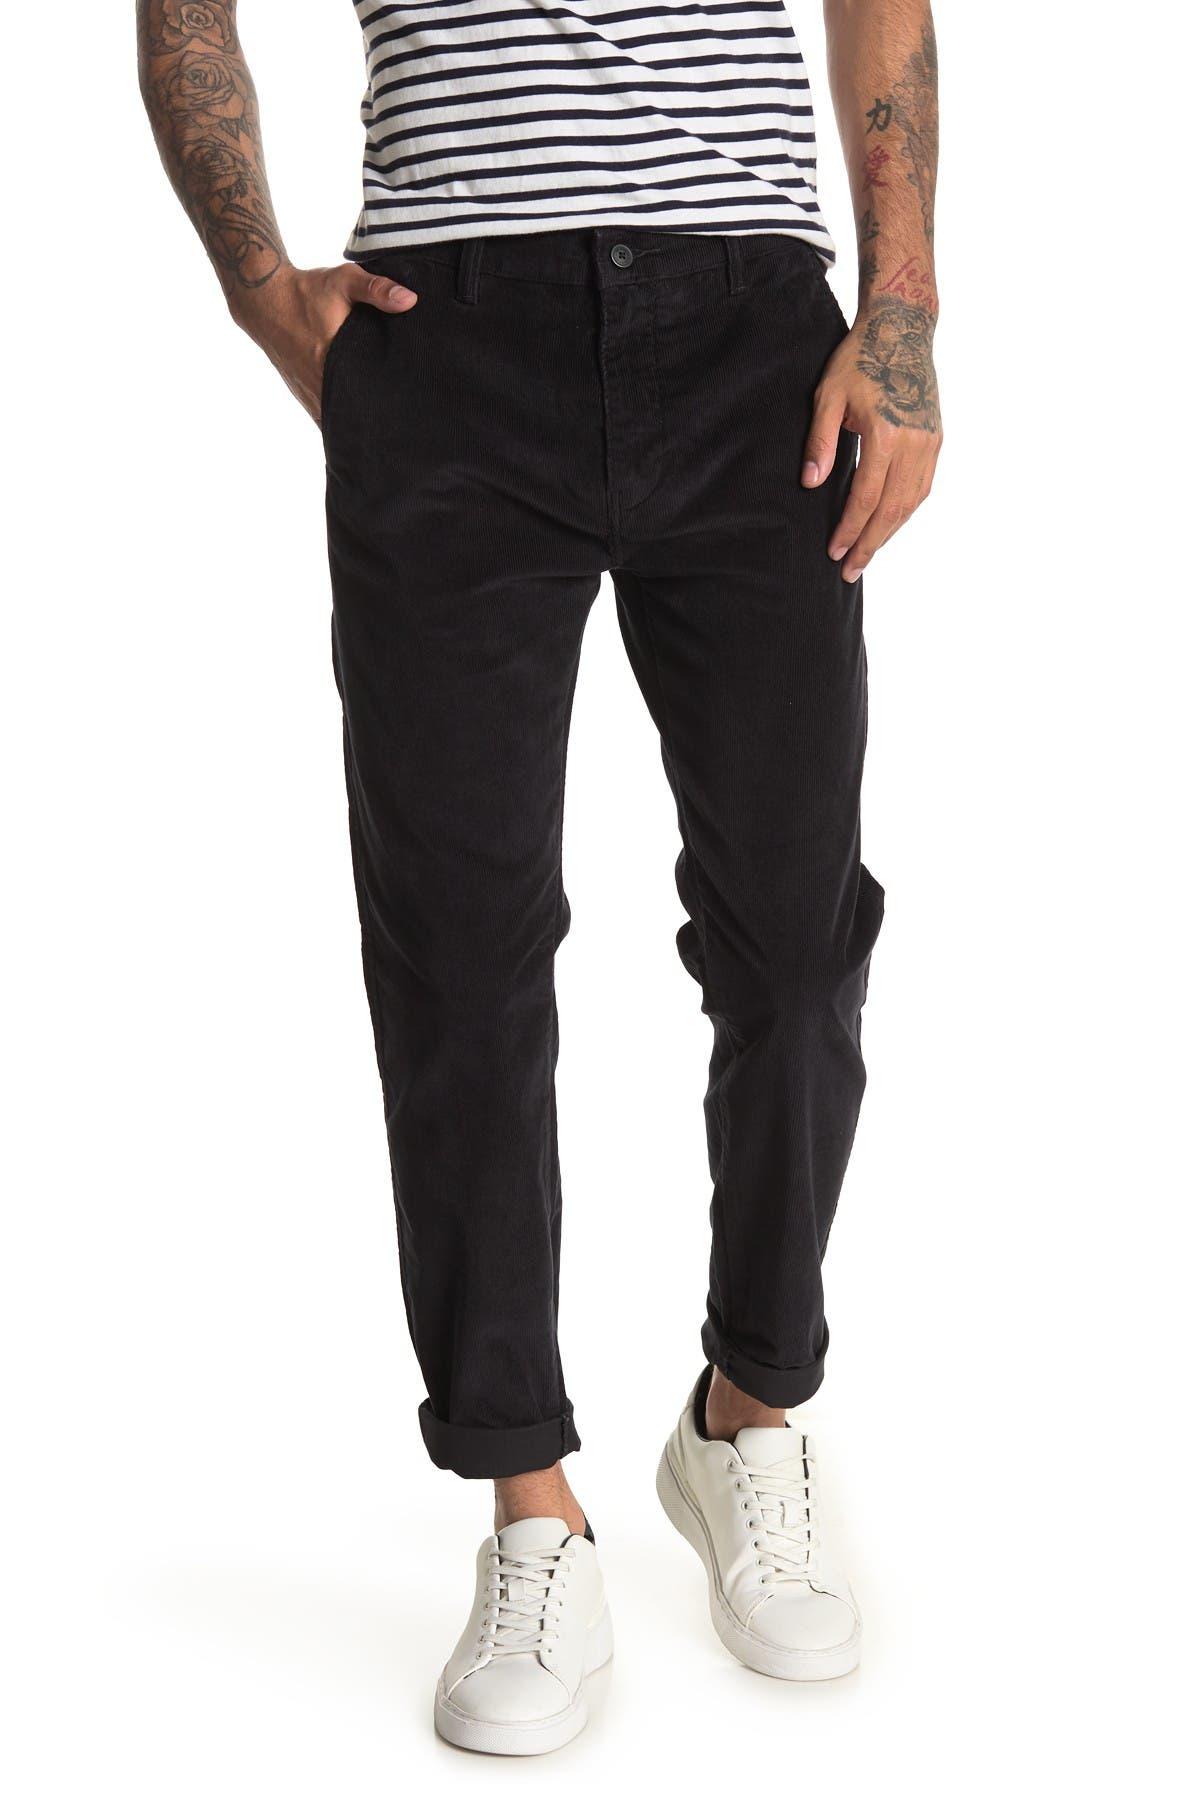 "Image of Levi's Chino Standard Tapered Leg Pants - 29-34"" Inseam"